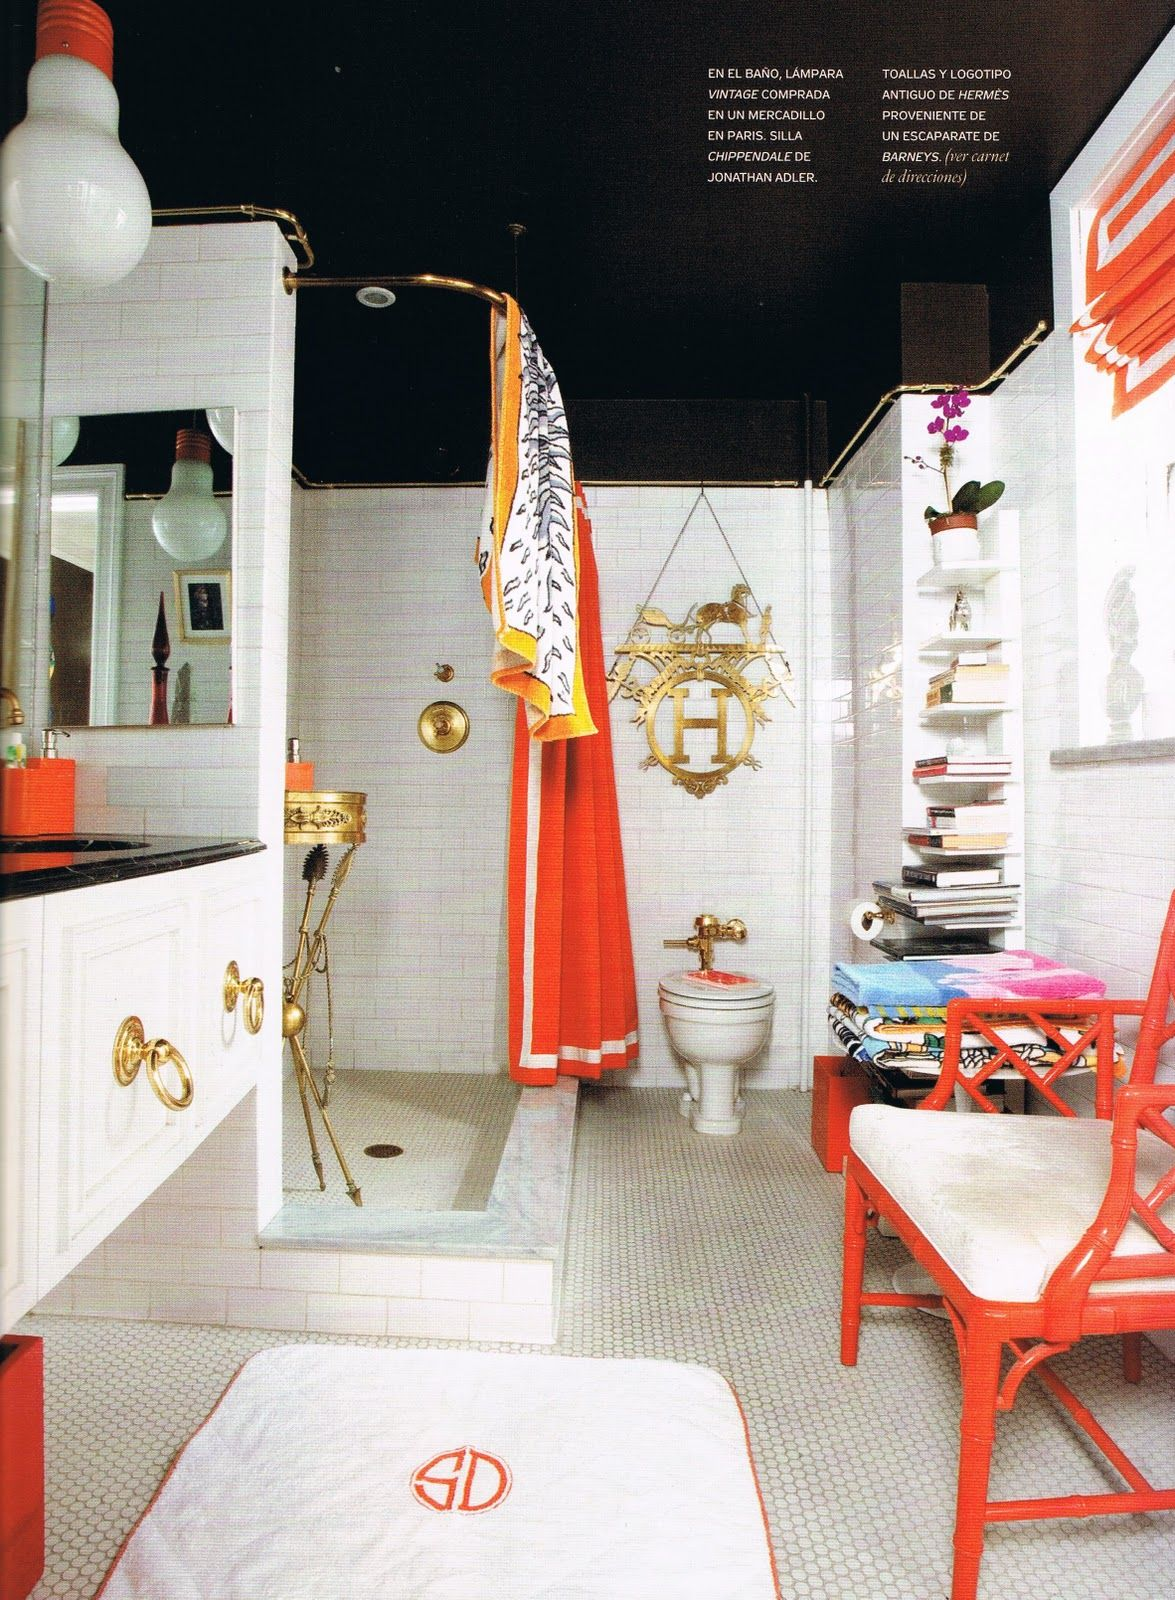 Bon Chair Jonathan Adleru0027s Bathroom